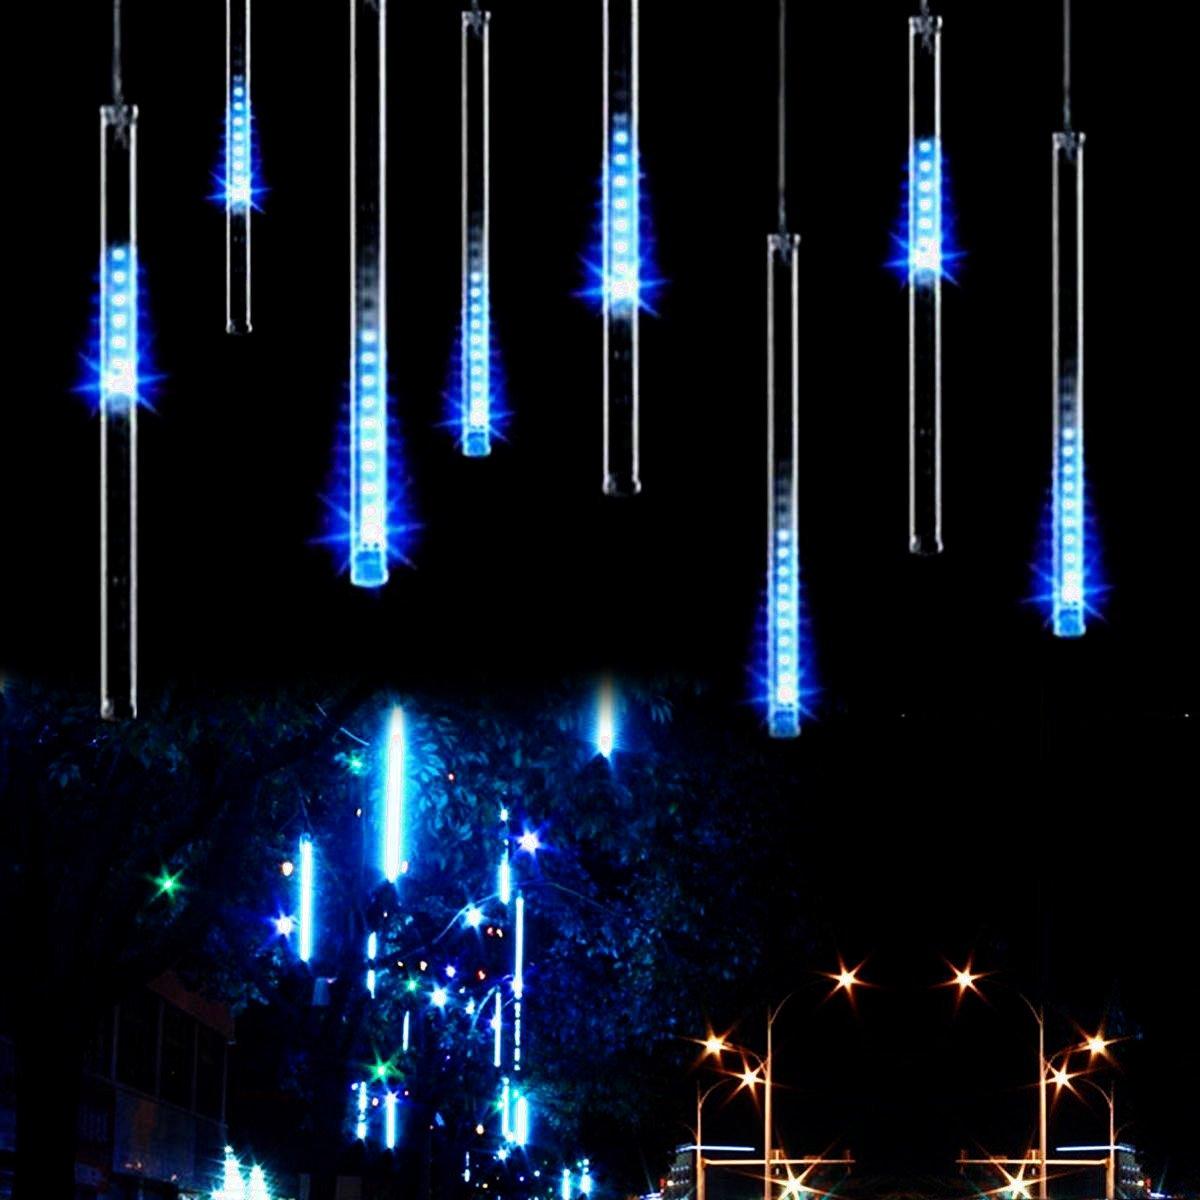 Meteors Shower Light, Guaiboshi 30cm 8 Tubes 144LEDs USB Powered Waterproof Rain Drop Light Icicle Fairy Lights for Xmas(Blue) [Energy Class A+]